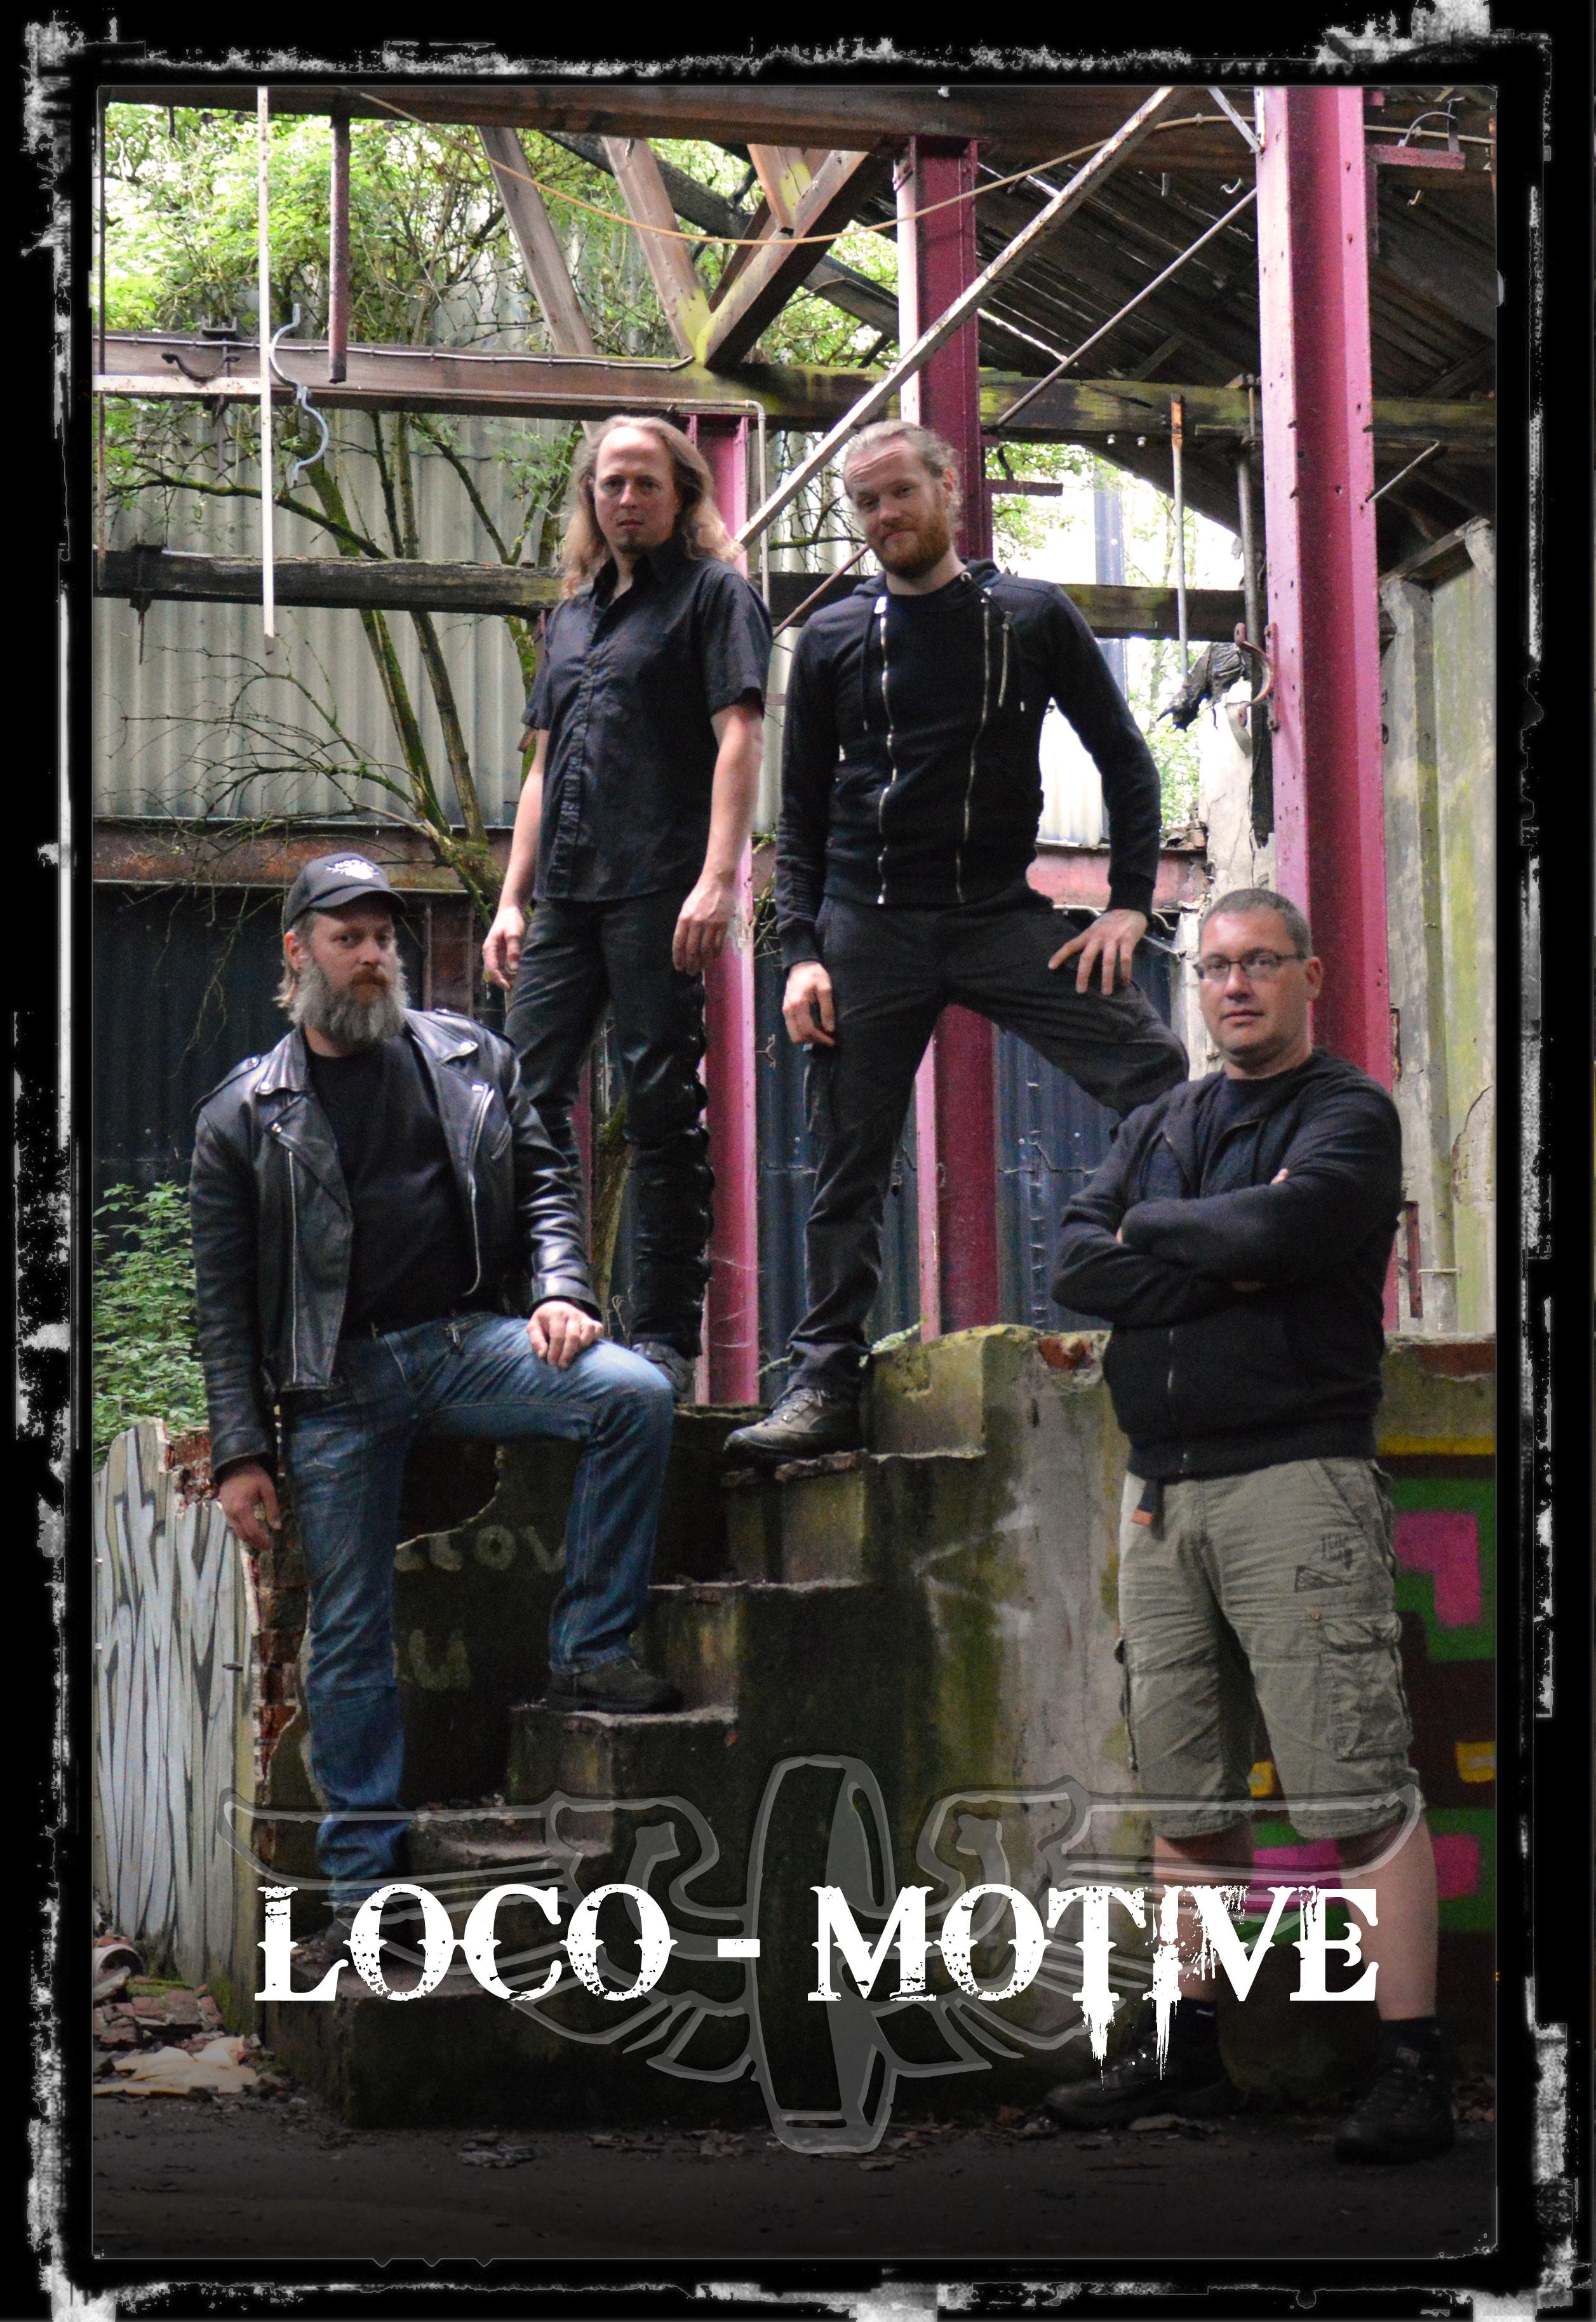 LOCO-MOTIVE